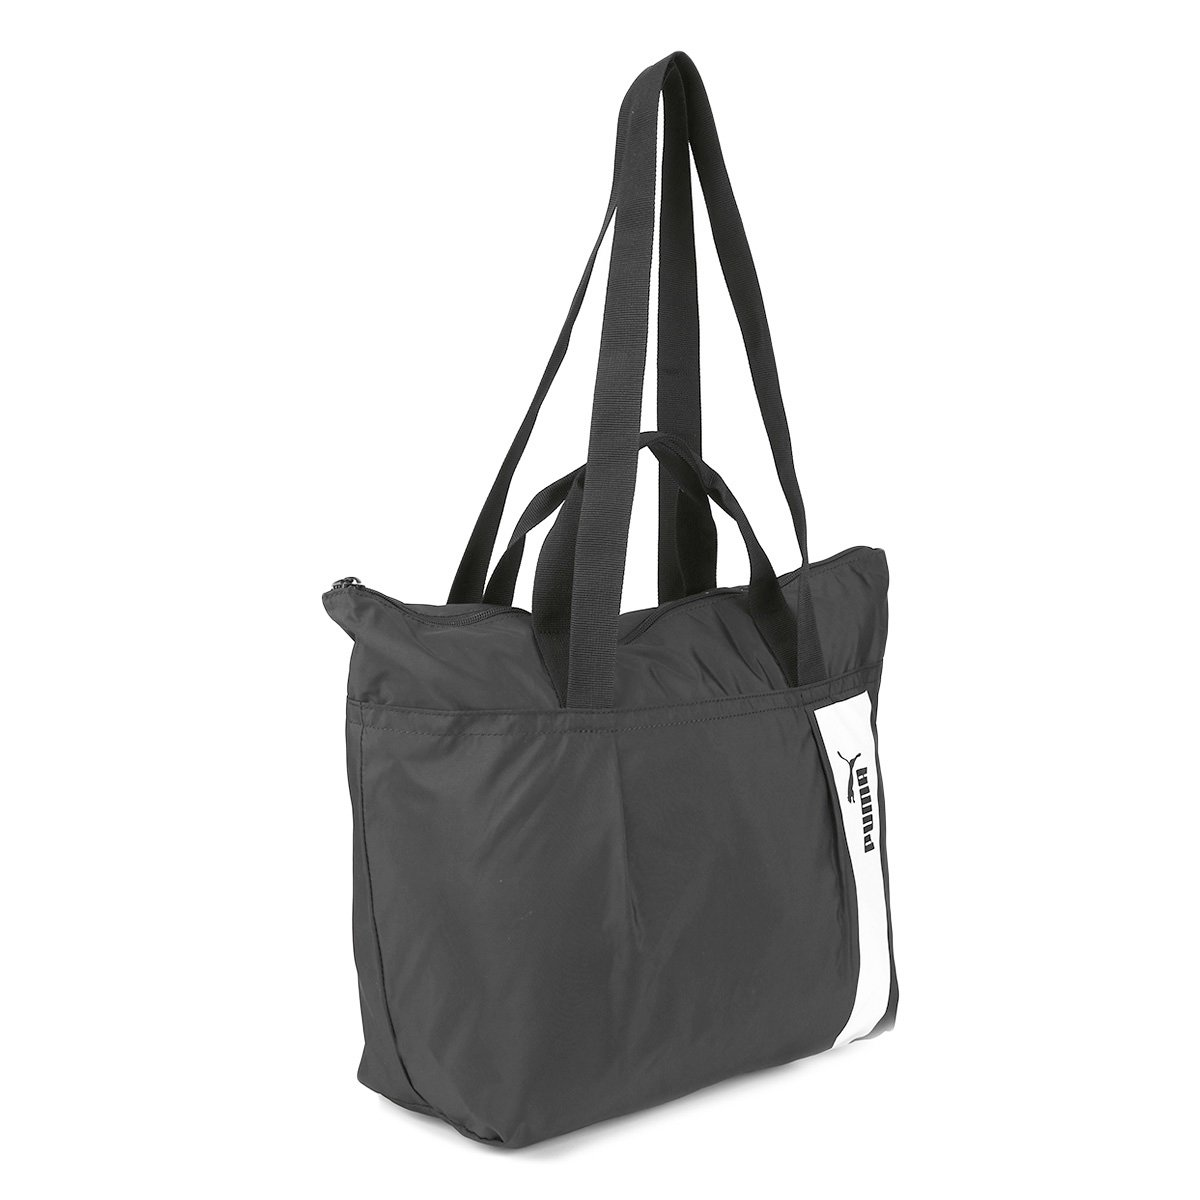 Bolsa Puma Core Style Large Shopper - Compre Agora  eeaab7dc164